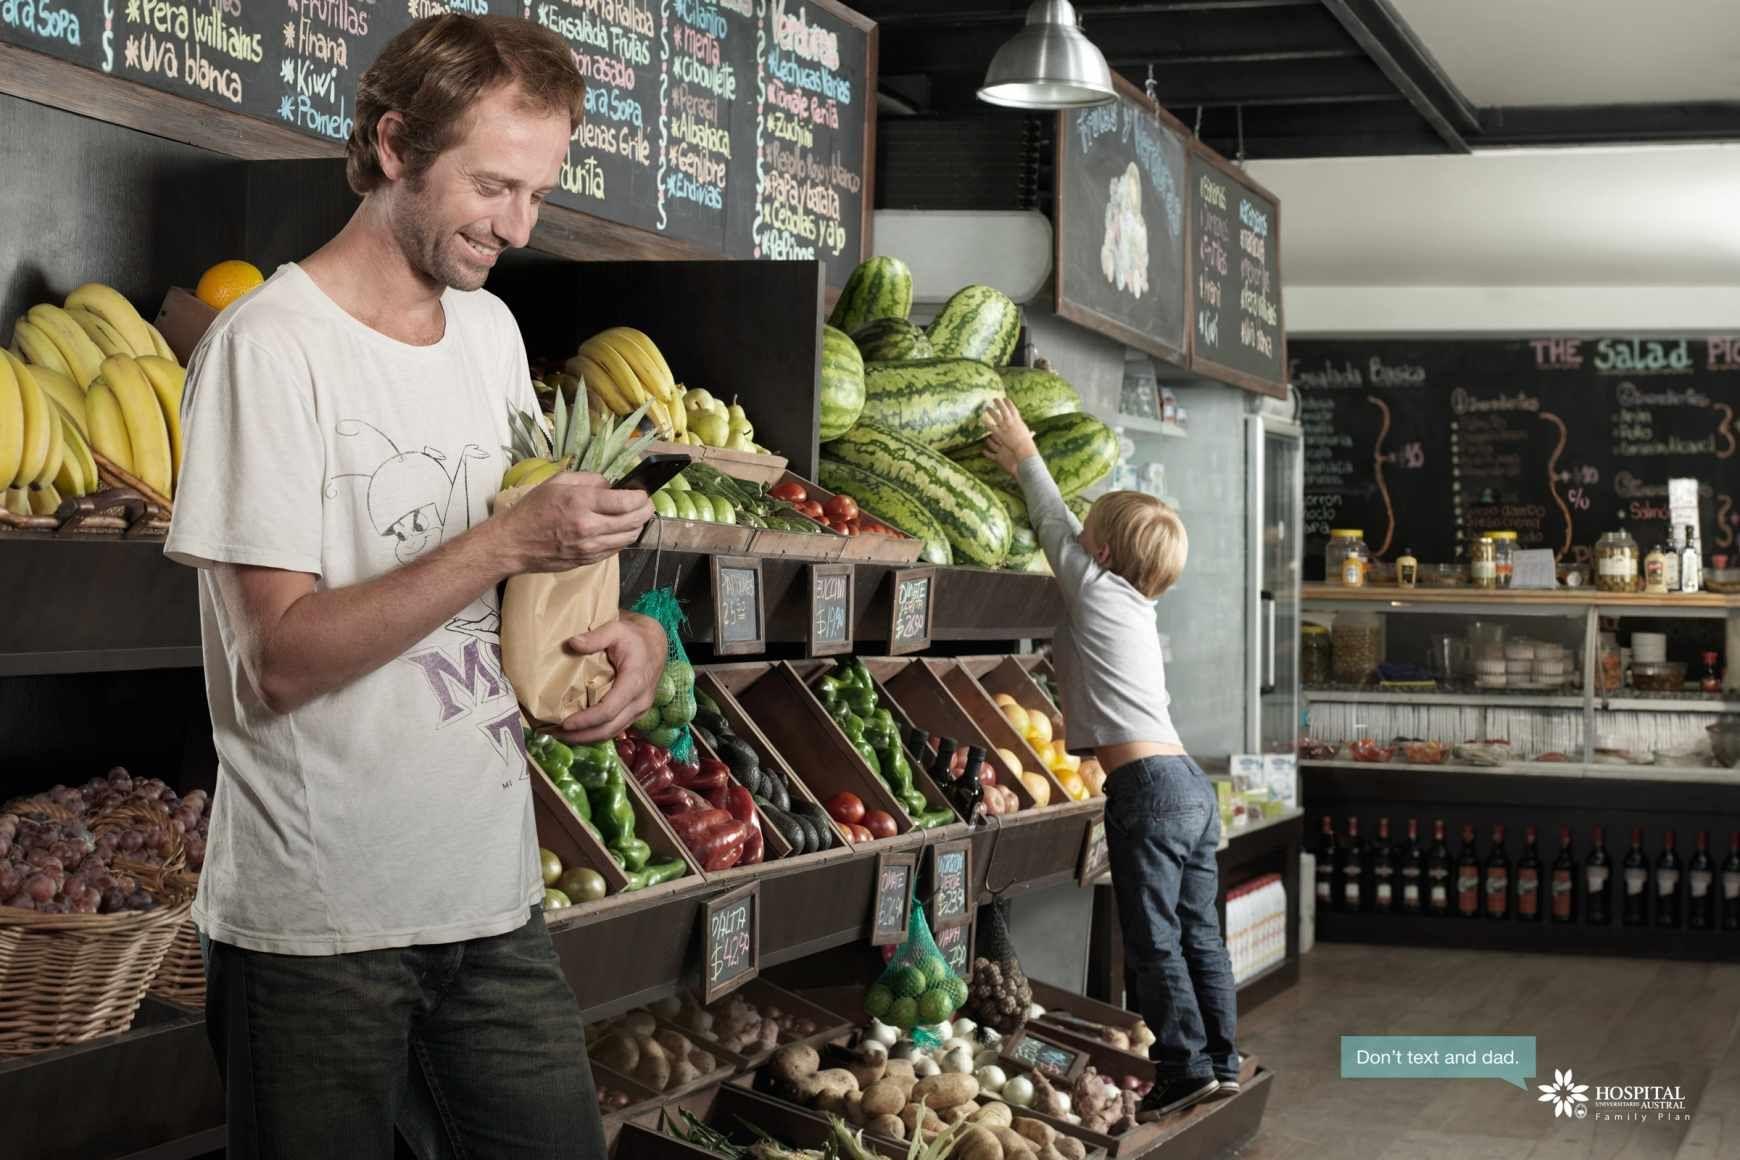 Hospital Austral: Family Plan, Vegetable stand